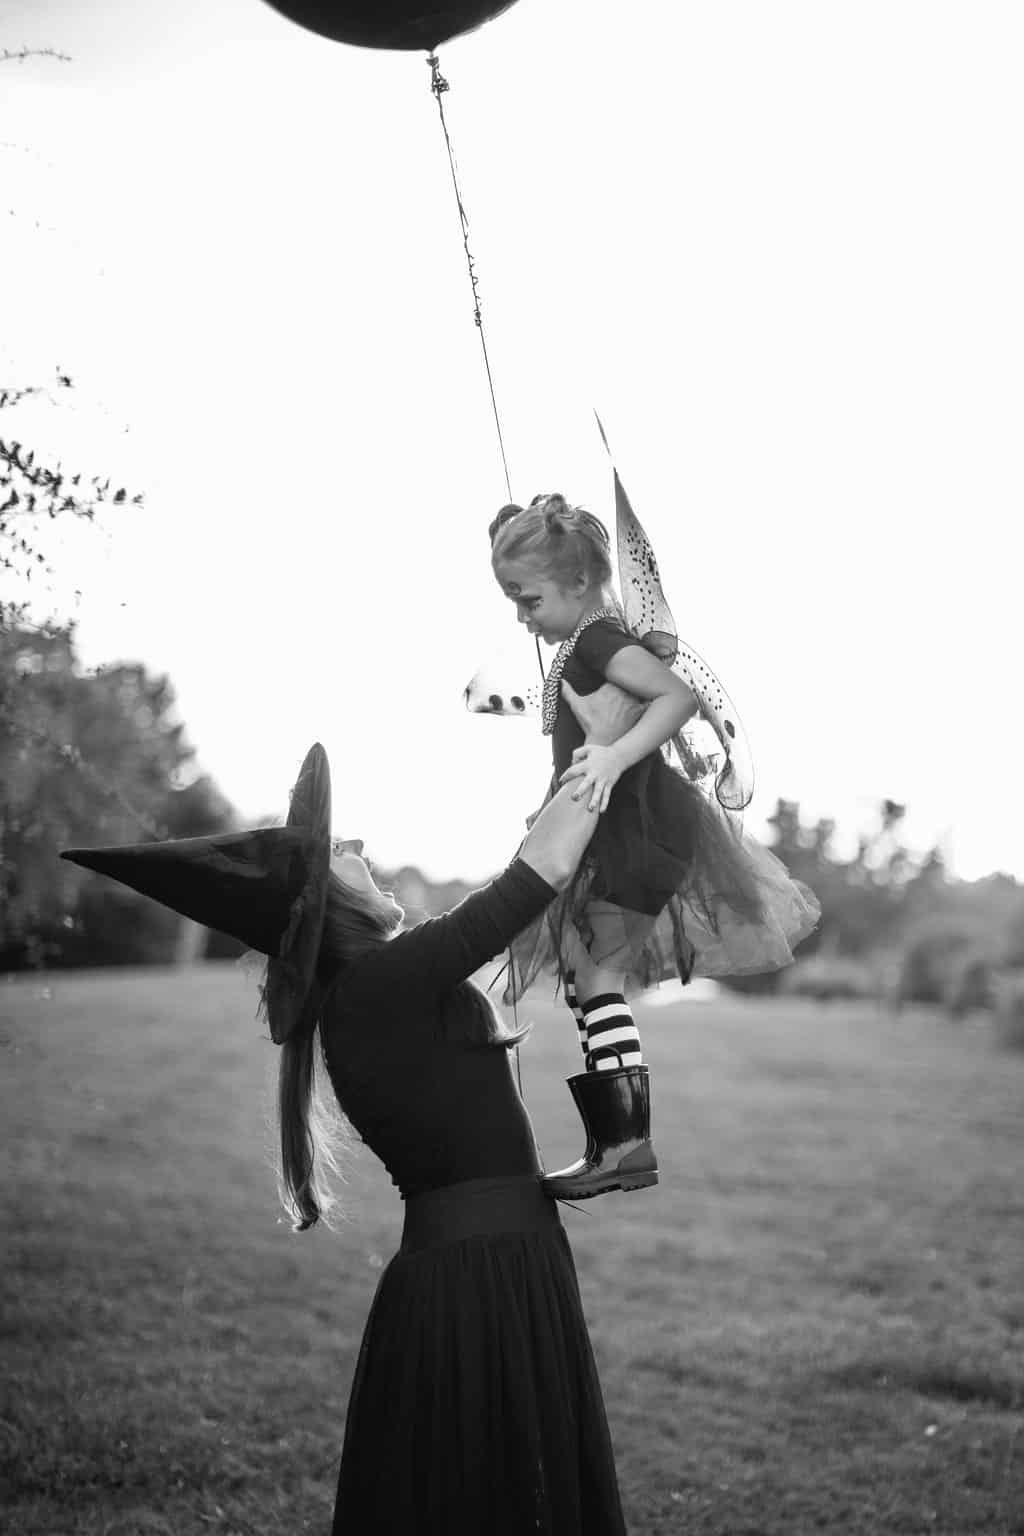 Embracing-The-Magic-of-Halloween-Kid-Style-girl